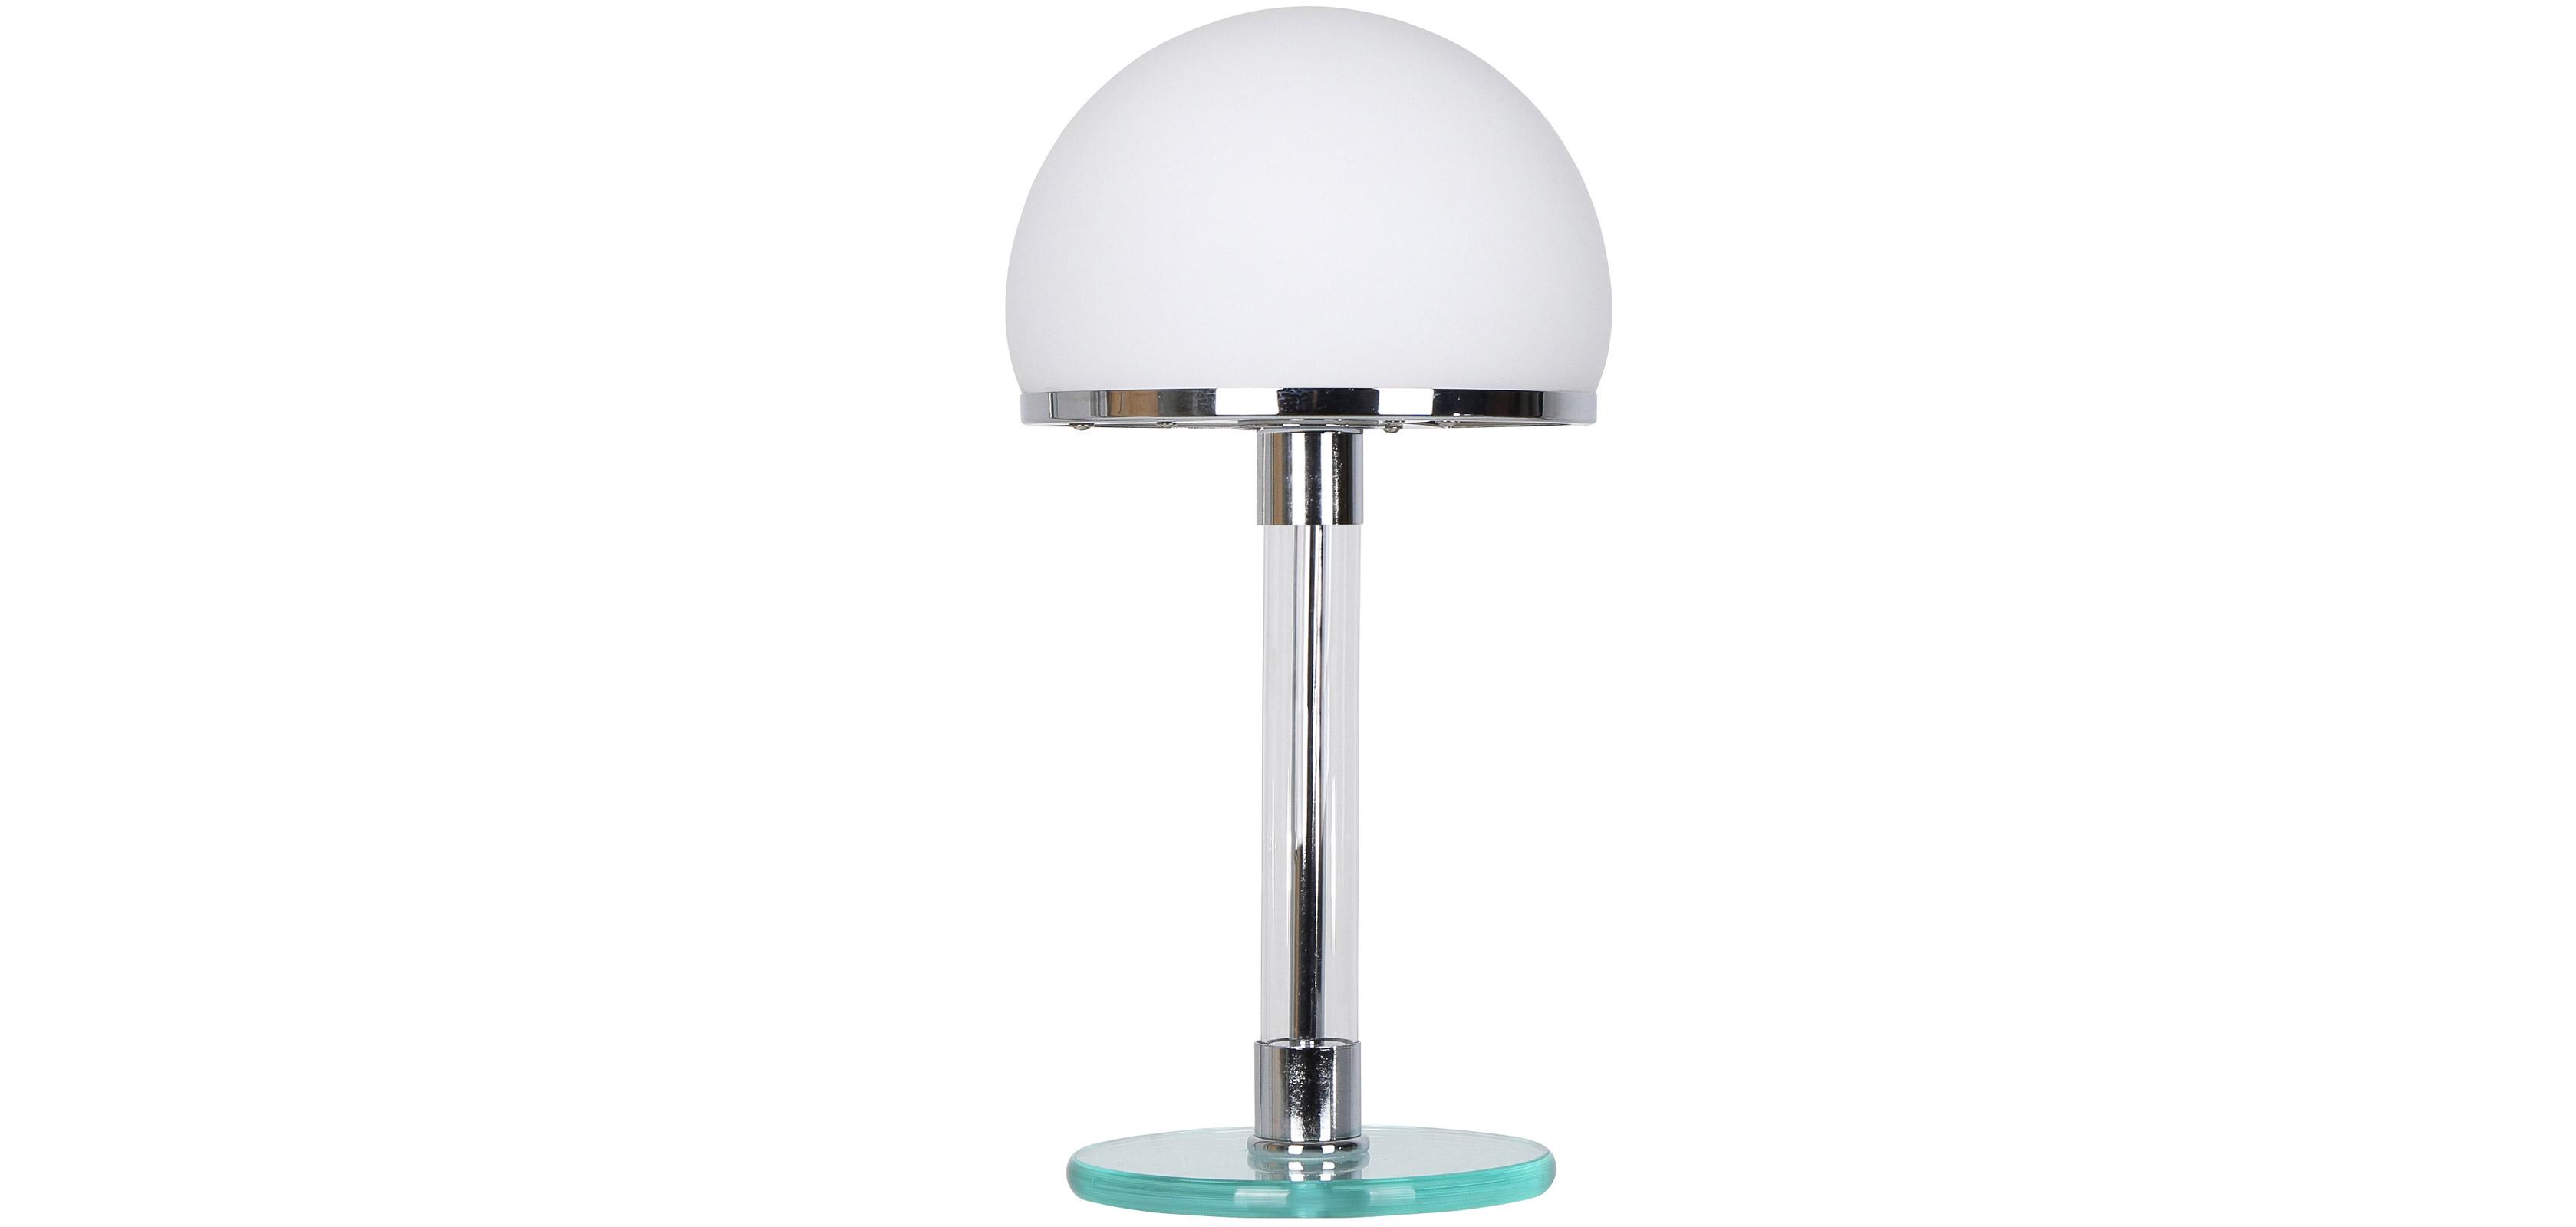 bauhaus lampe wilhelm wagenfeld kupfer glas. Black Bedroom Furniture Sets. Home Design Ideas